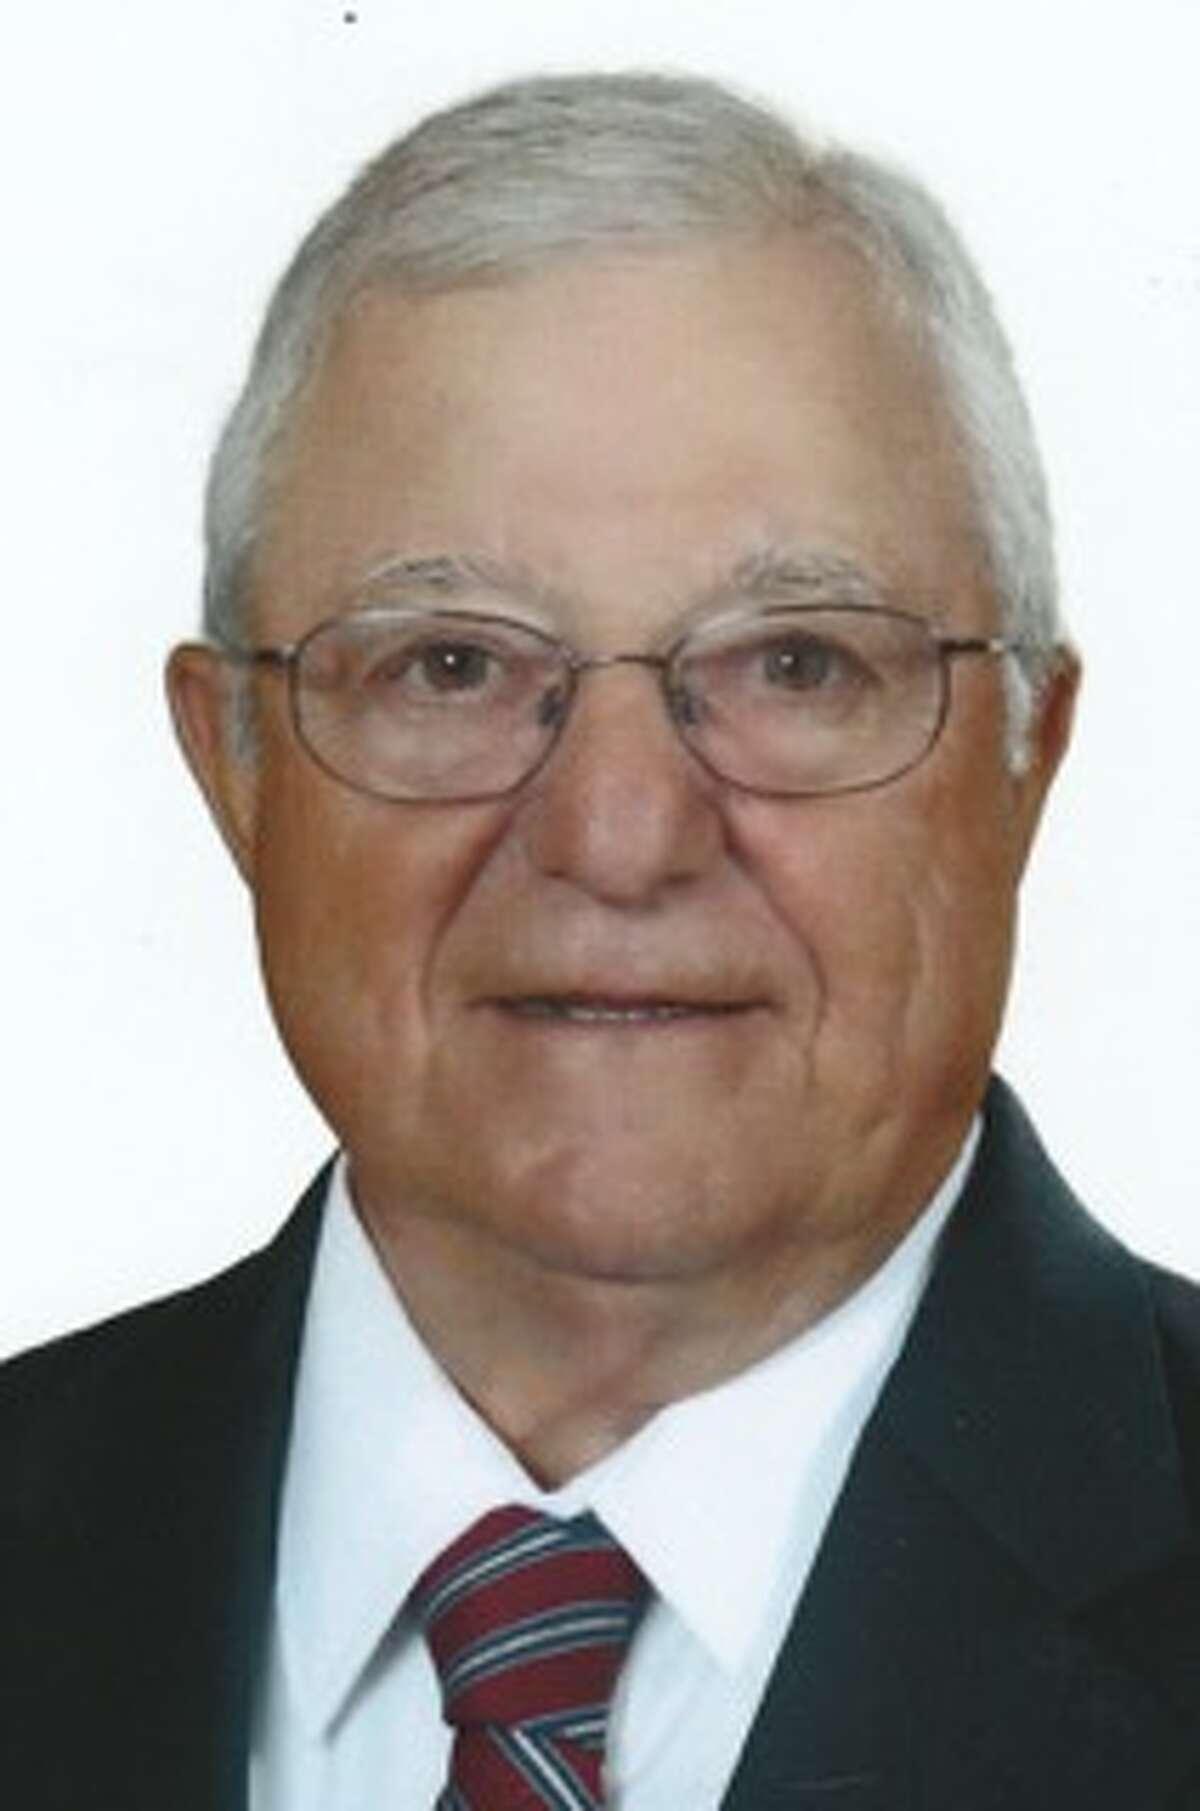 Patrick D. Spinola